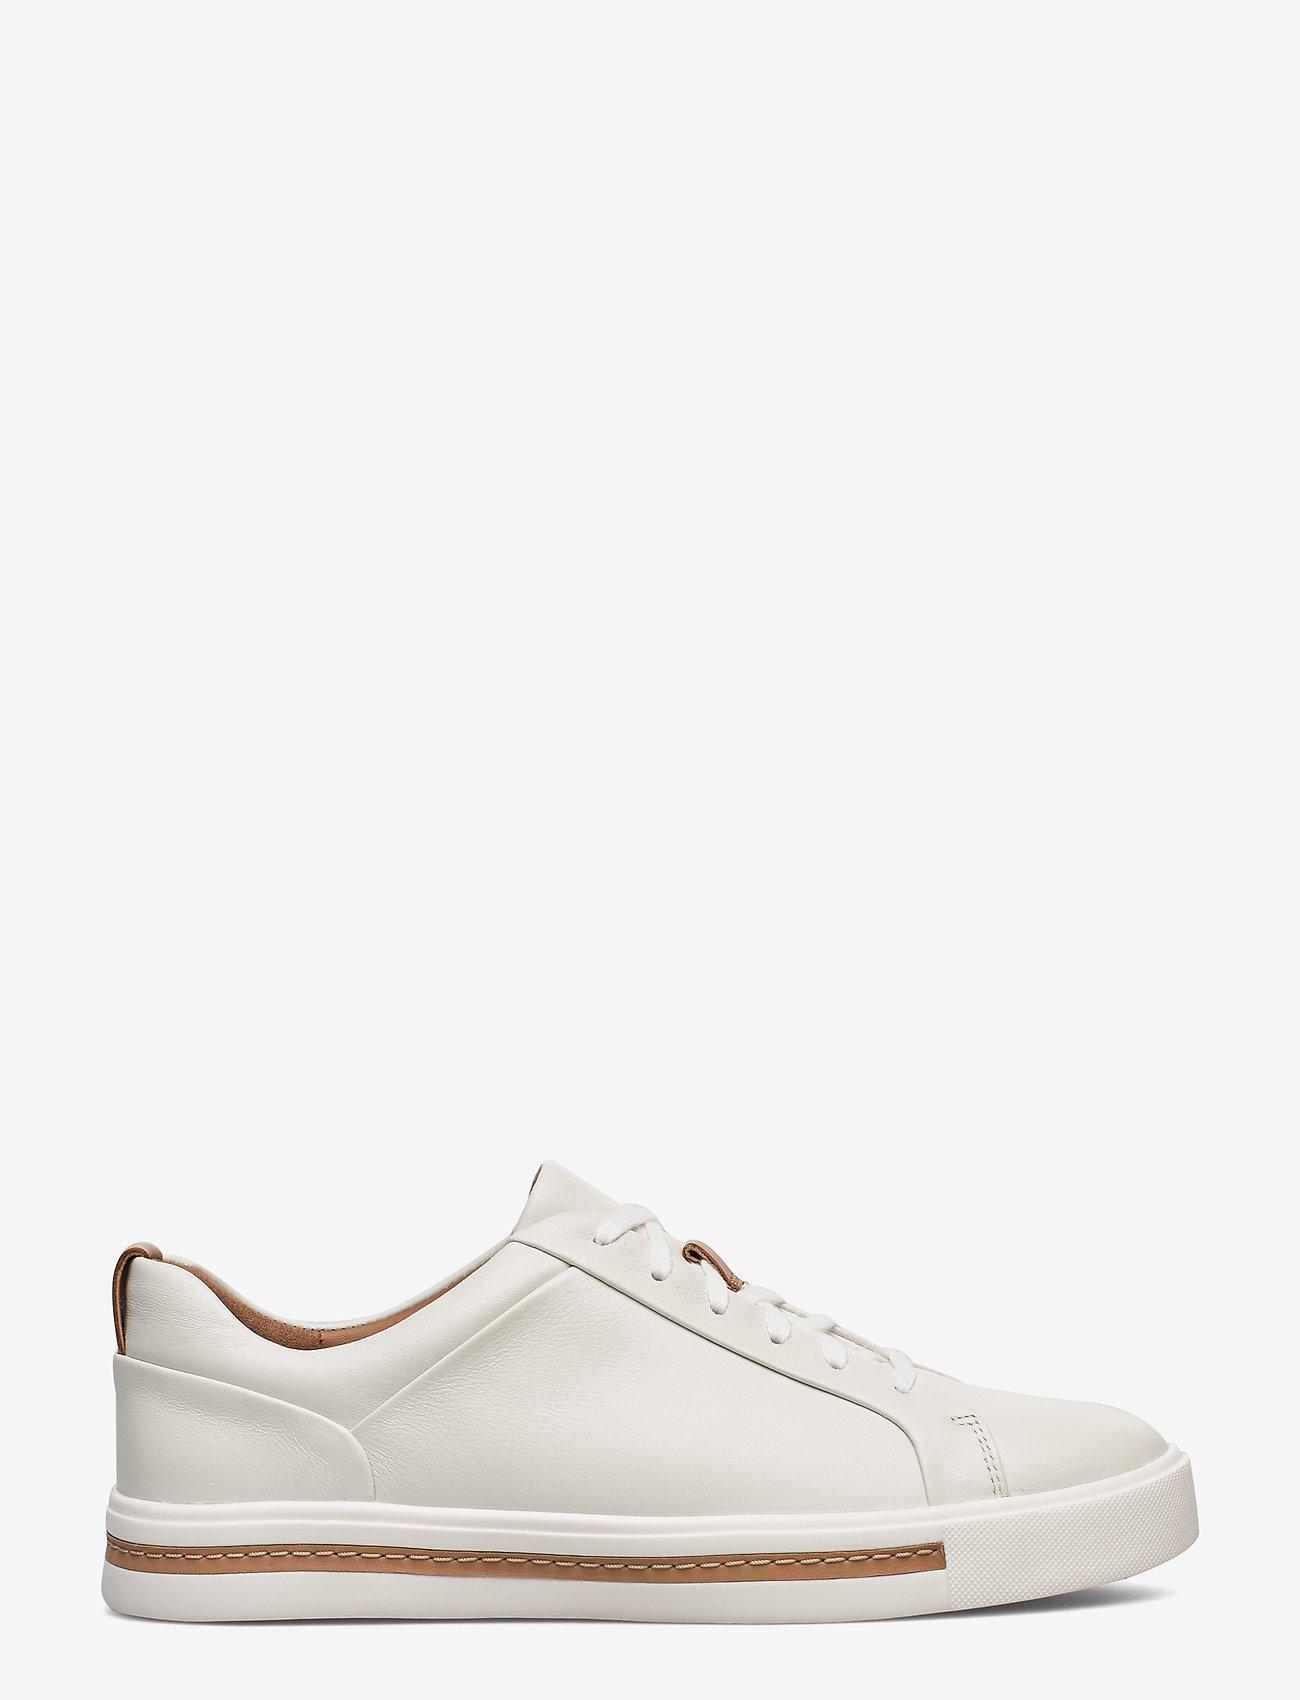 Clarks - Un Maui Lace - låga sneakers - white leather - 1